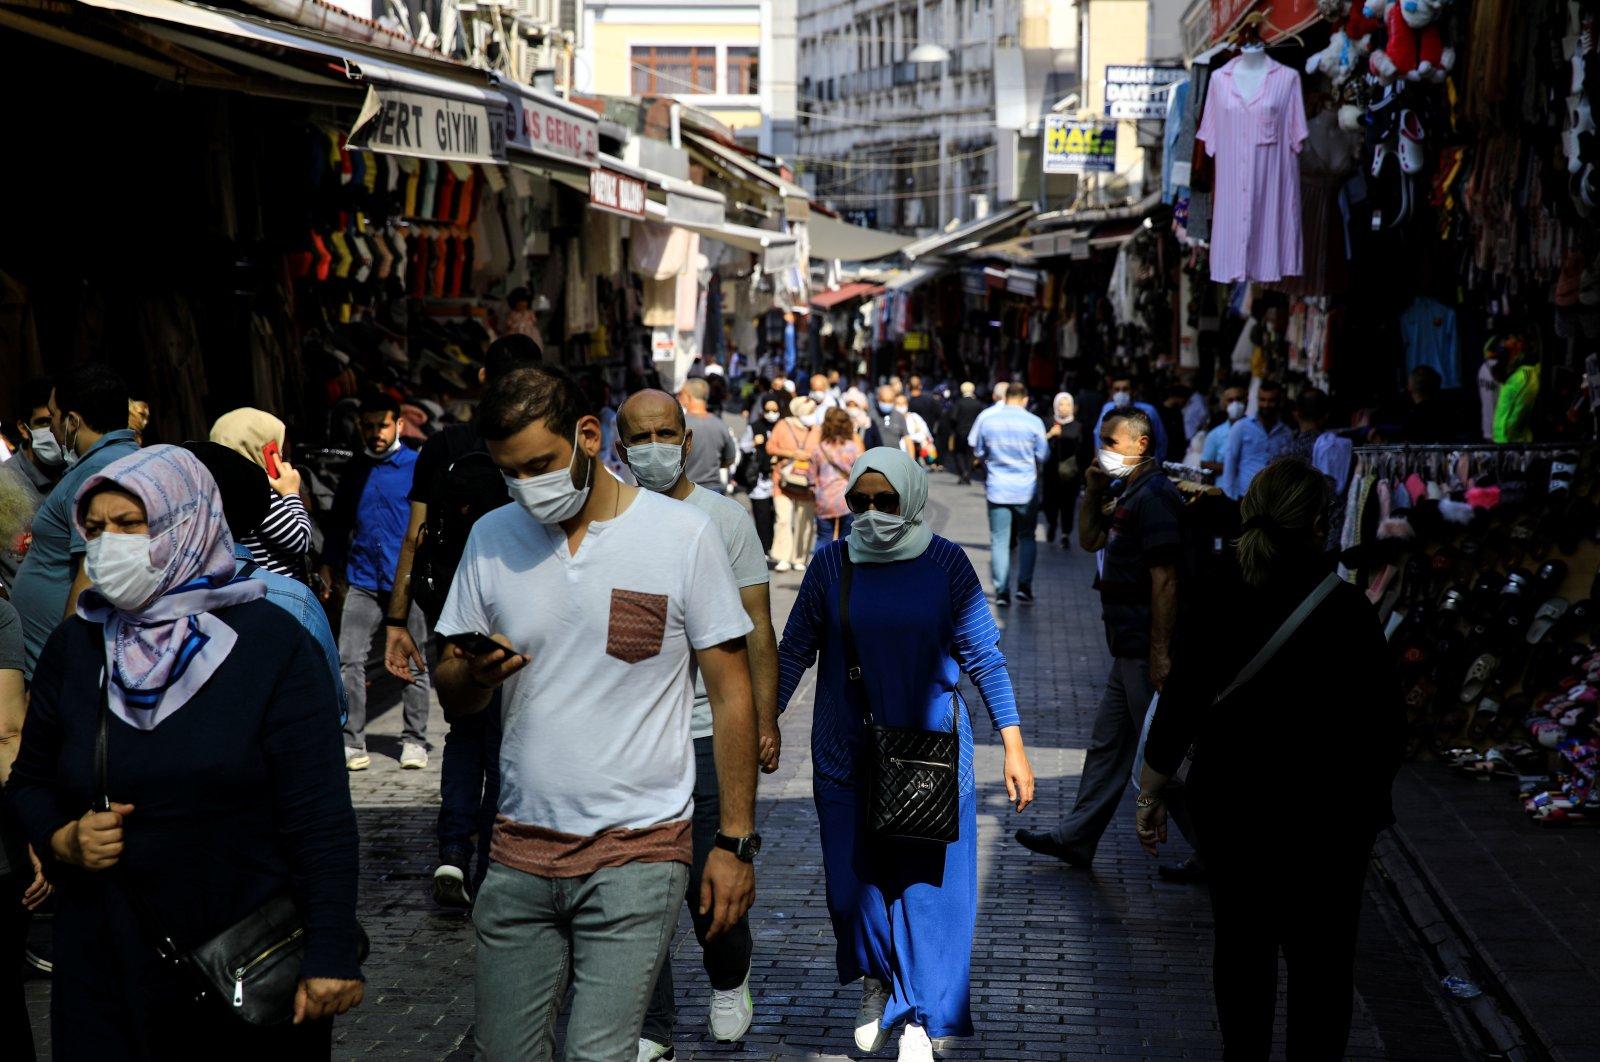 People wearing masks walk on a street in Eminönü district, in Istanbul, Turkey, Sept. 24, 2020. (REUTERS Photo)